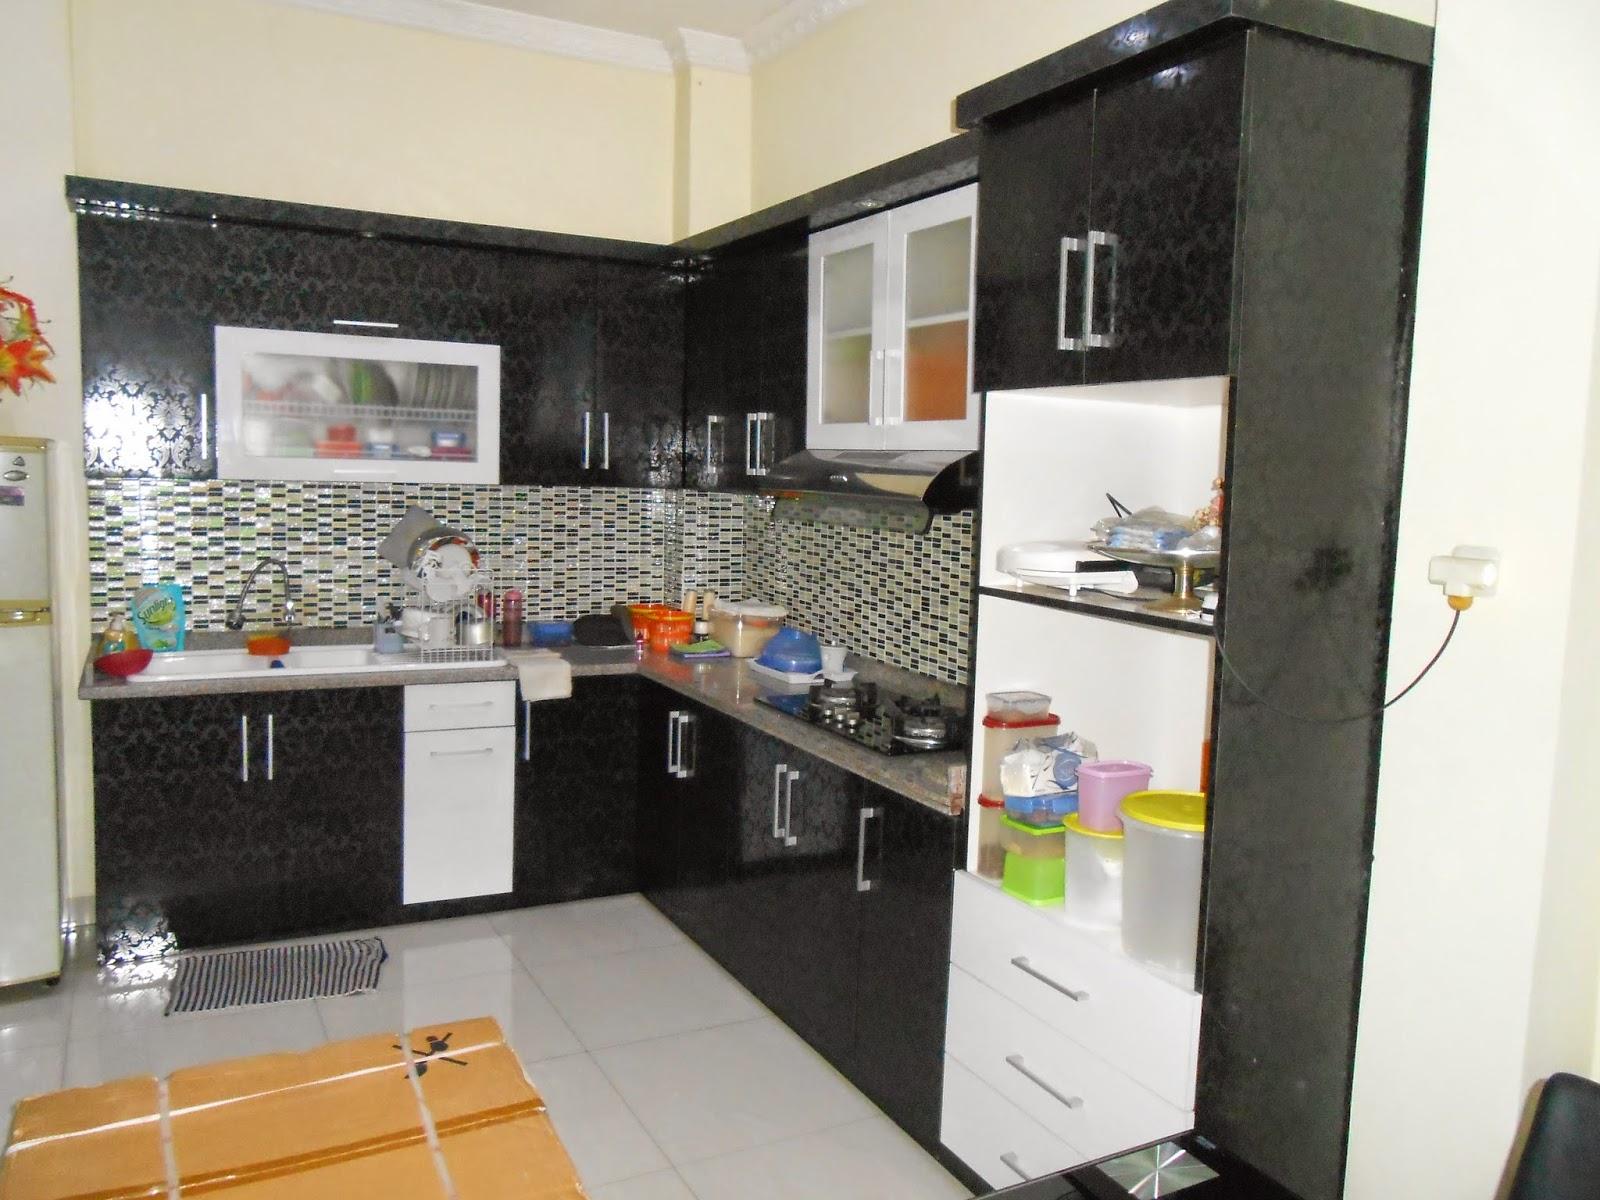 Bila Ingin Memanfaatkan Sedikit Ruang Kosong Pastikan Memilih Lemari Dengan Rak Tersusun Agar Muat Banyak Makanan Adanya Kitchen Set Dapur Kecil Murah